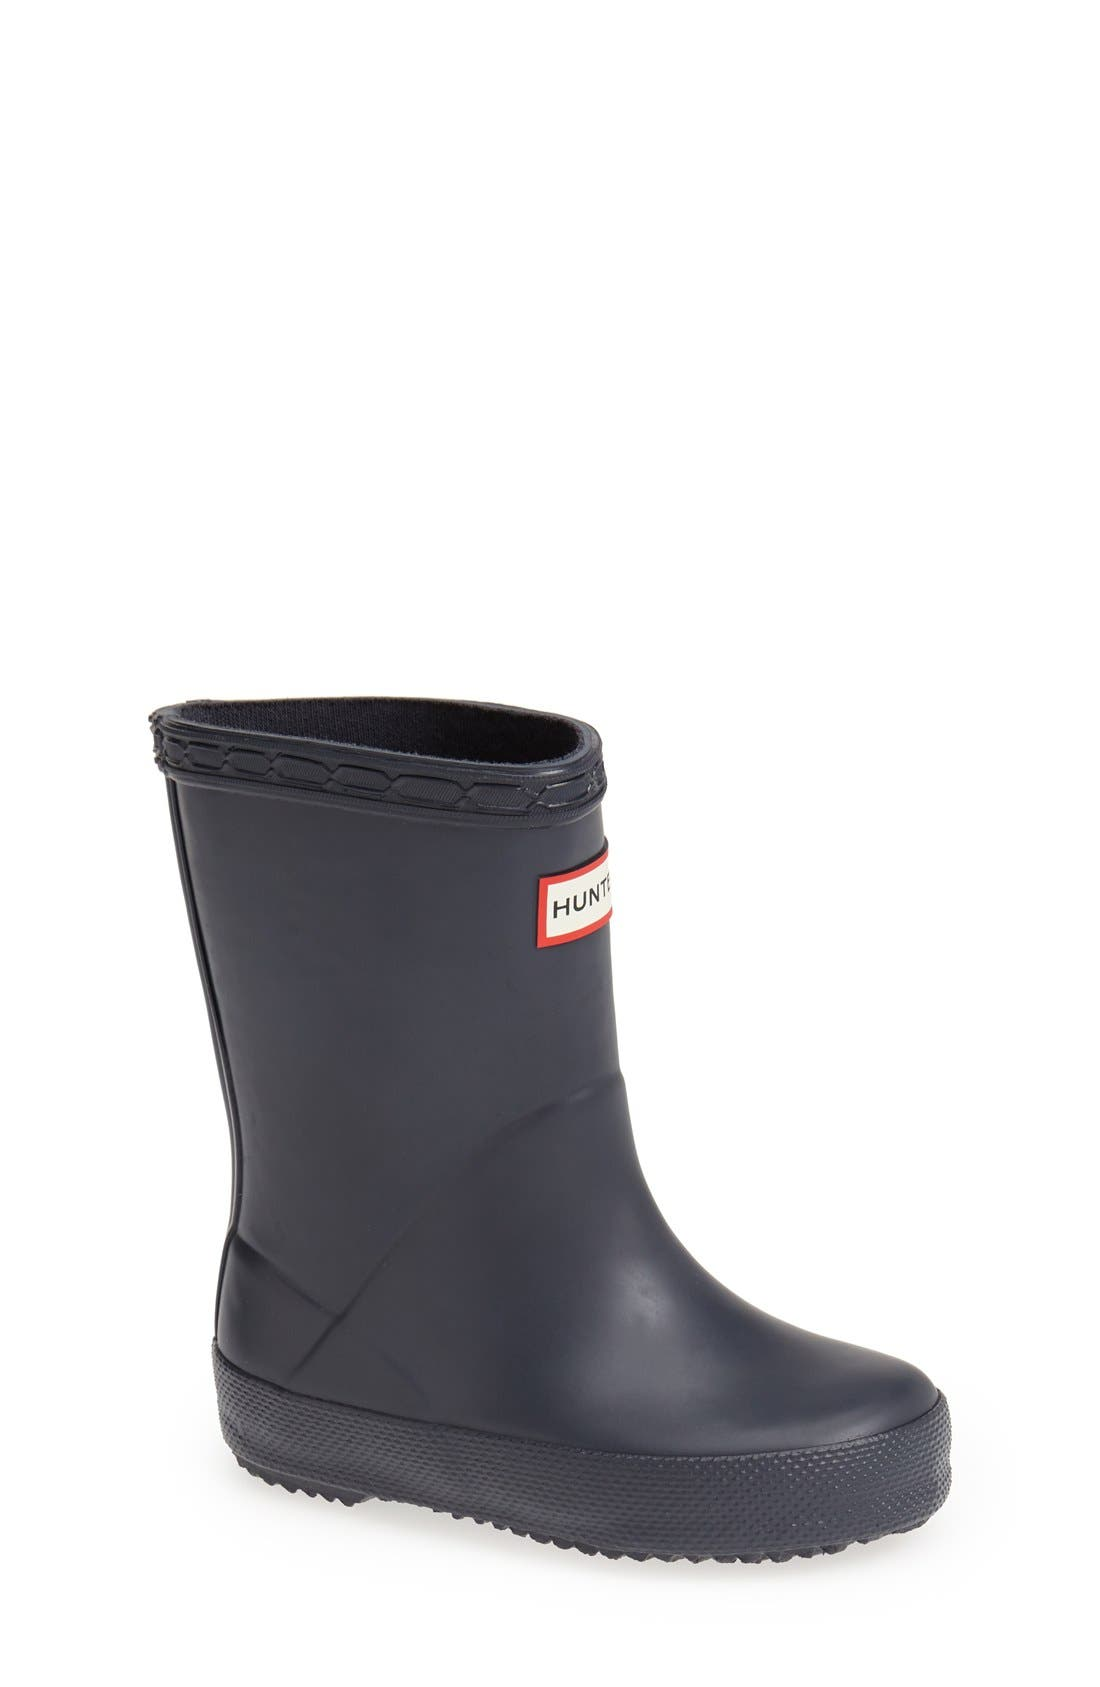 HUNTER First Classic Waterproof Rain Boot, Main, color, NAVY